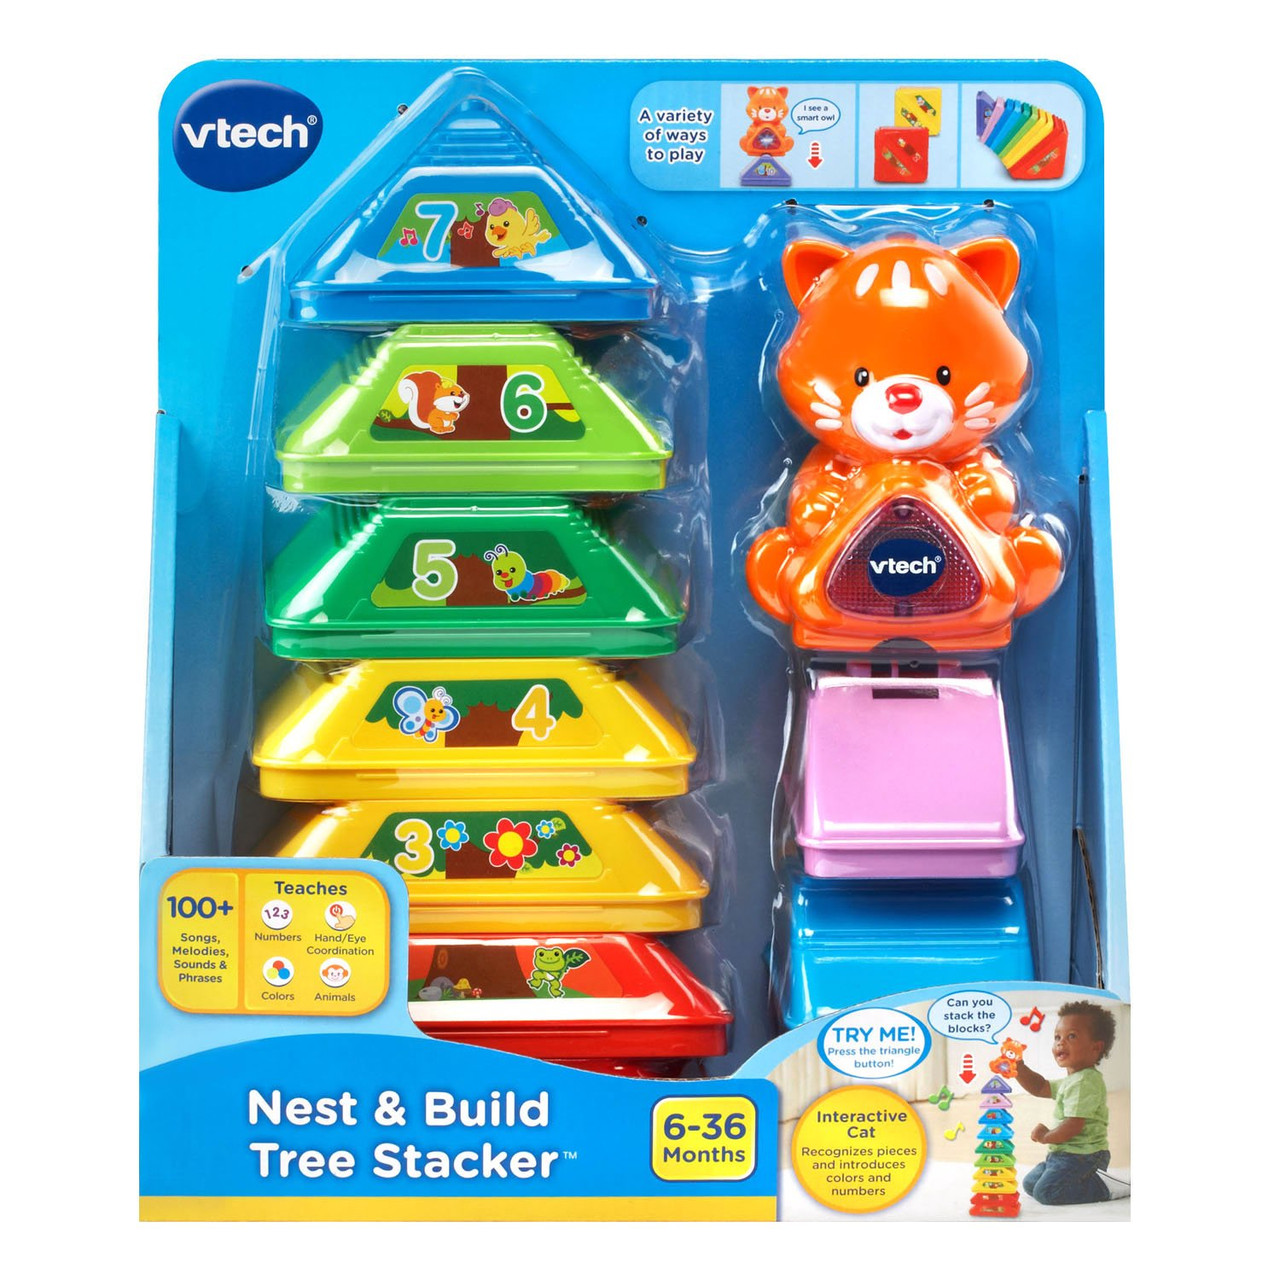 VTECH NEST & BUILD TREE STACKER